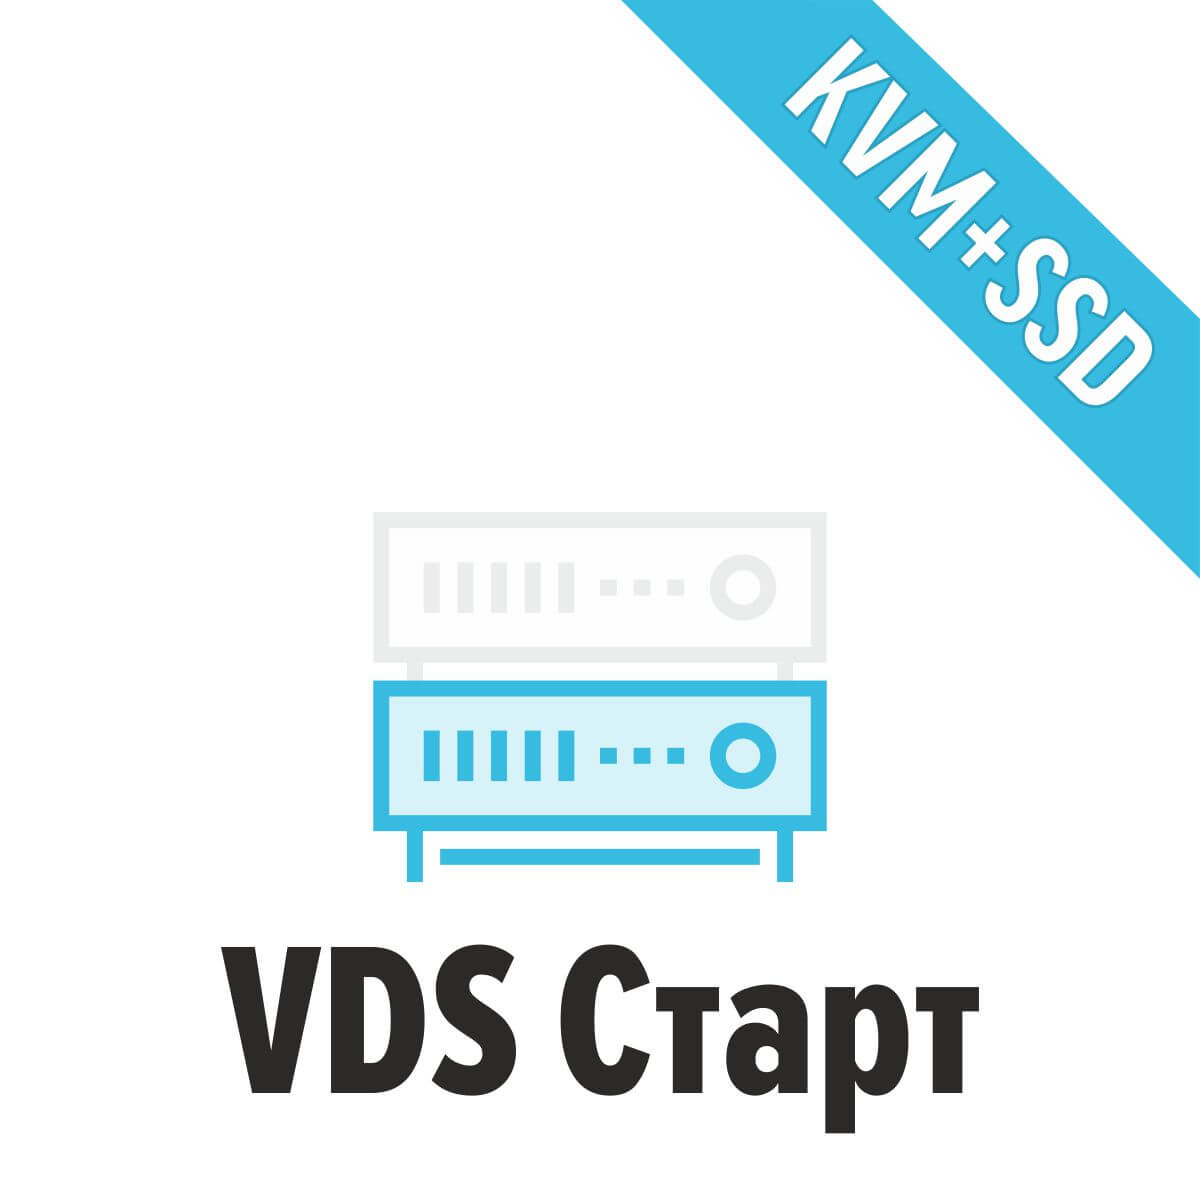 VDS Старт (KVM, SSD, 1 Core, 1Gb RAM, 20Gb SSD)